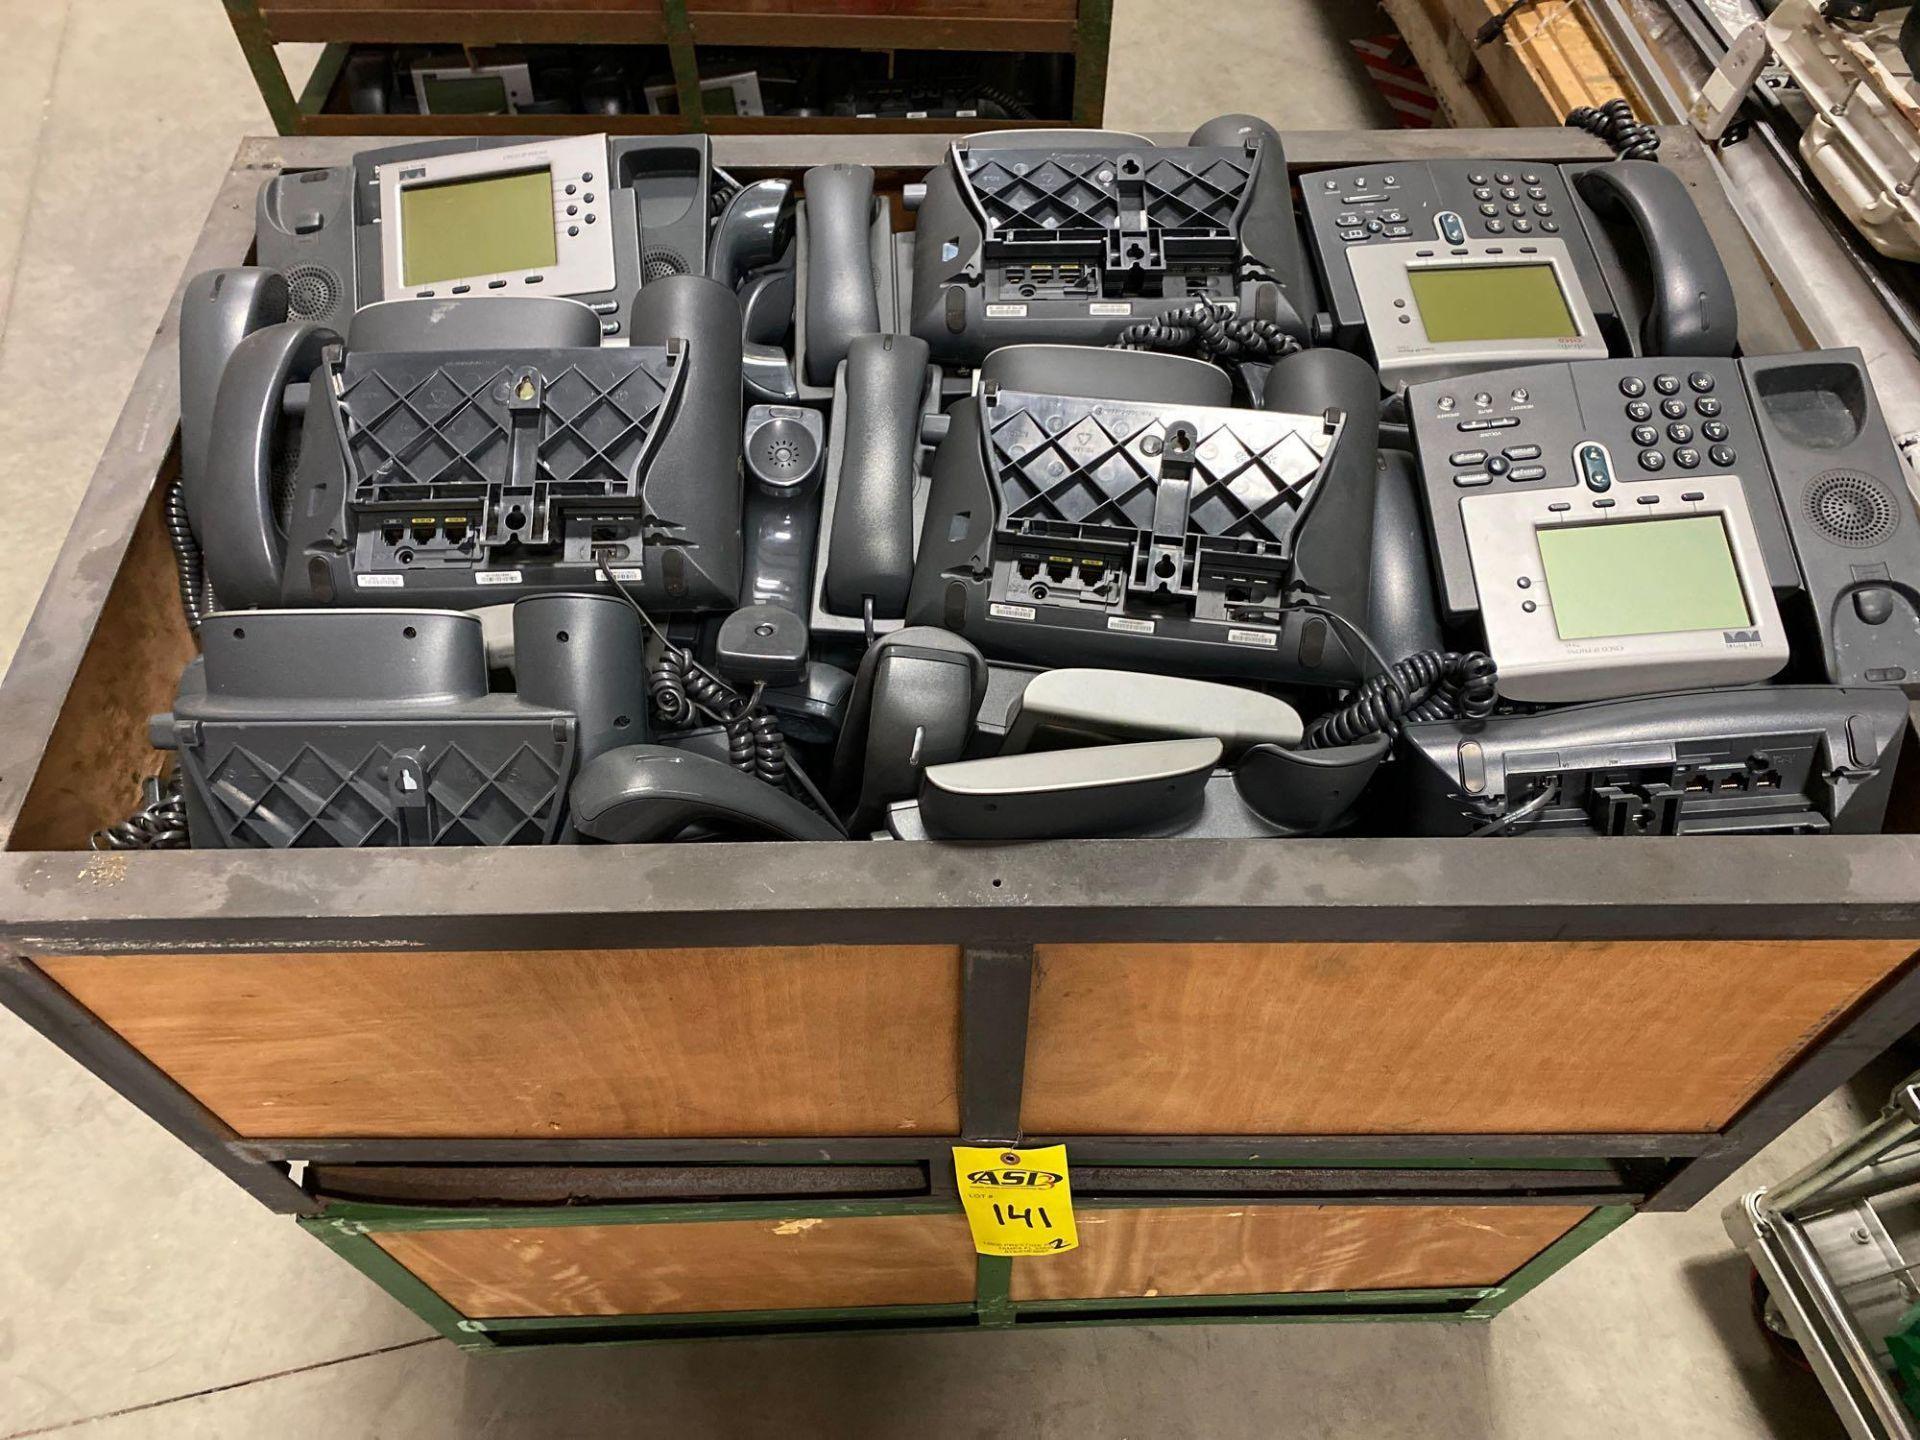 Lot 141 - TWO CRATES OF CISCO IP PHONES